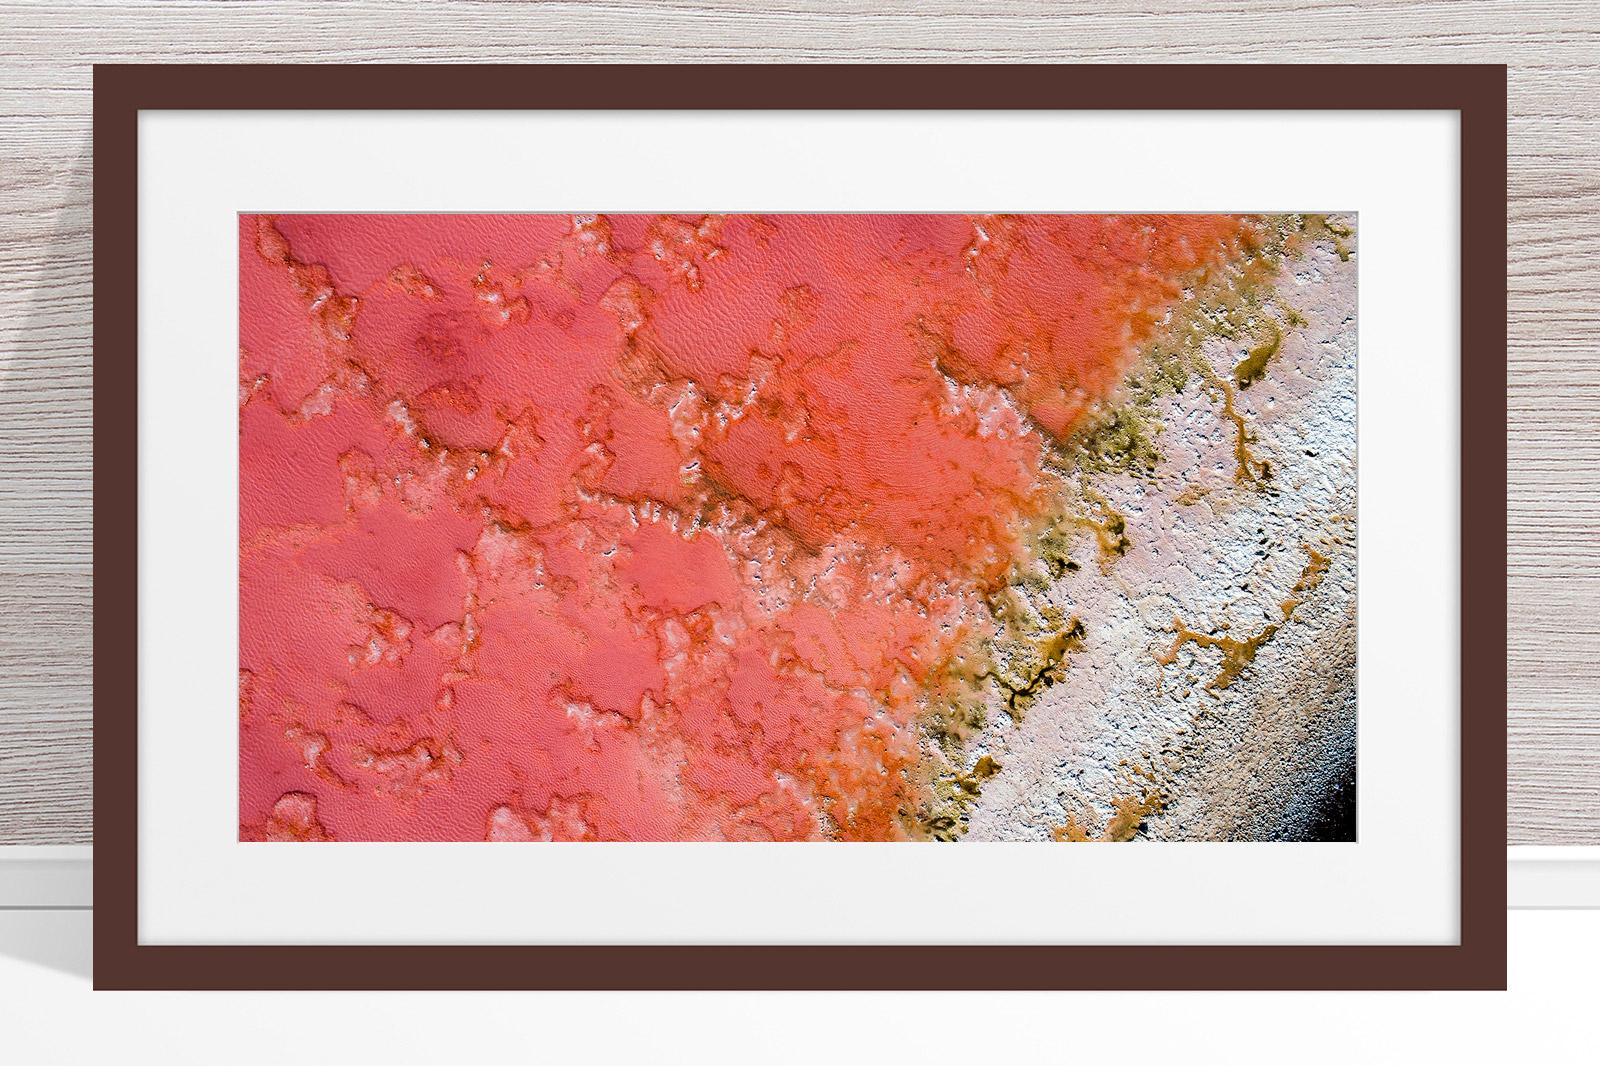 002 - Jason Mazur - 'Pink Lake, Port Gregory' Dark Frame